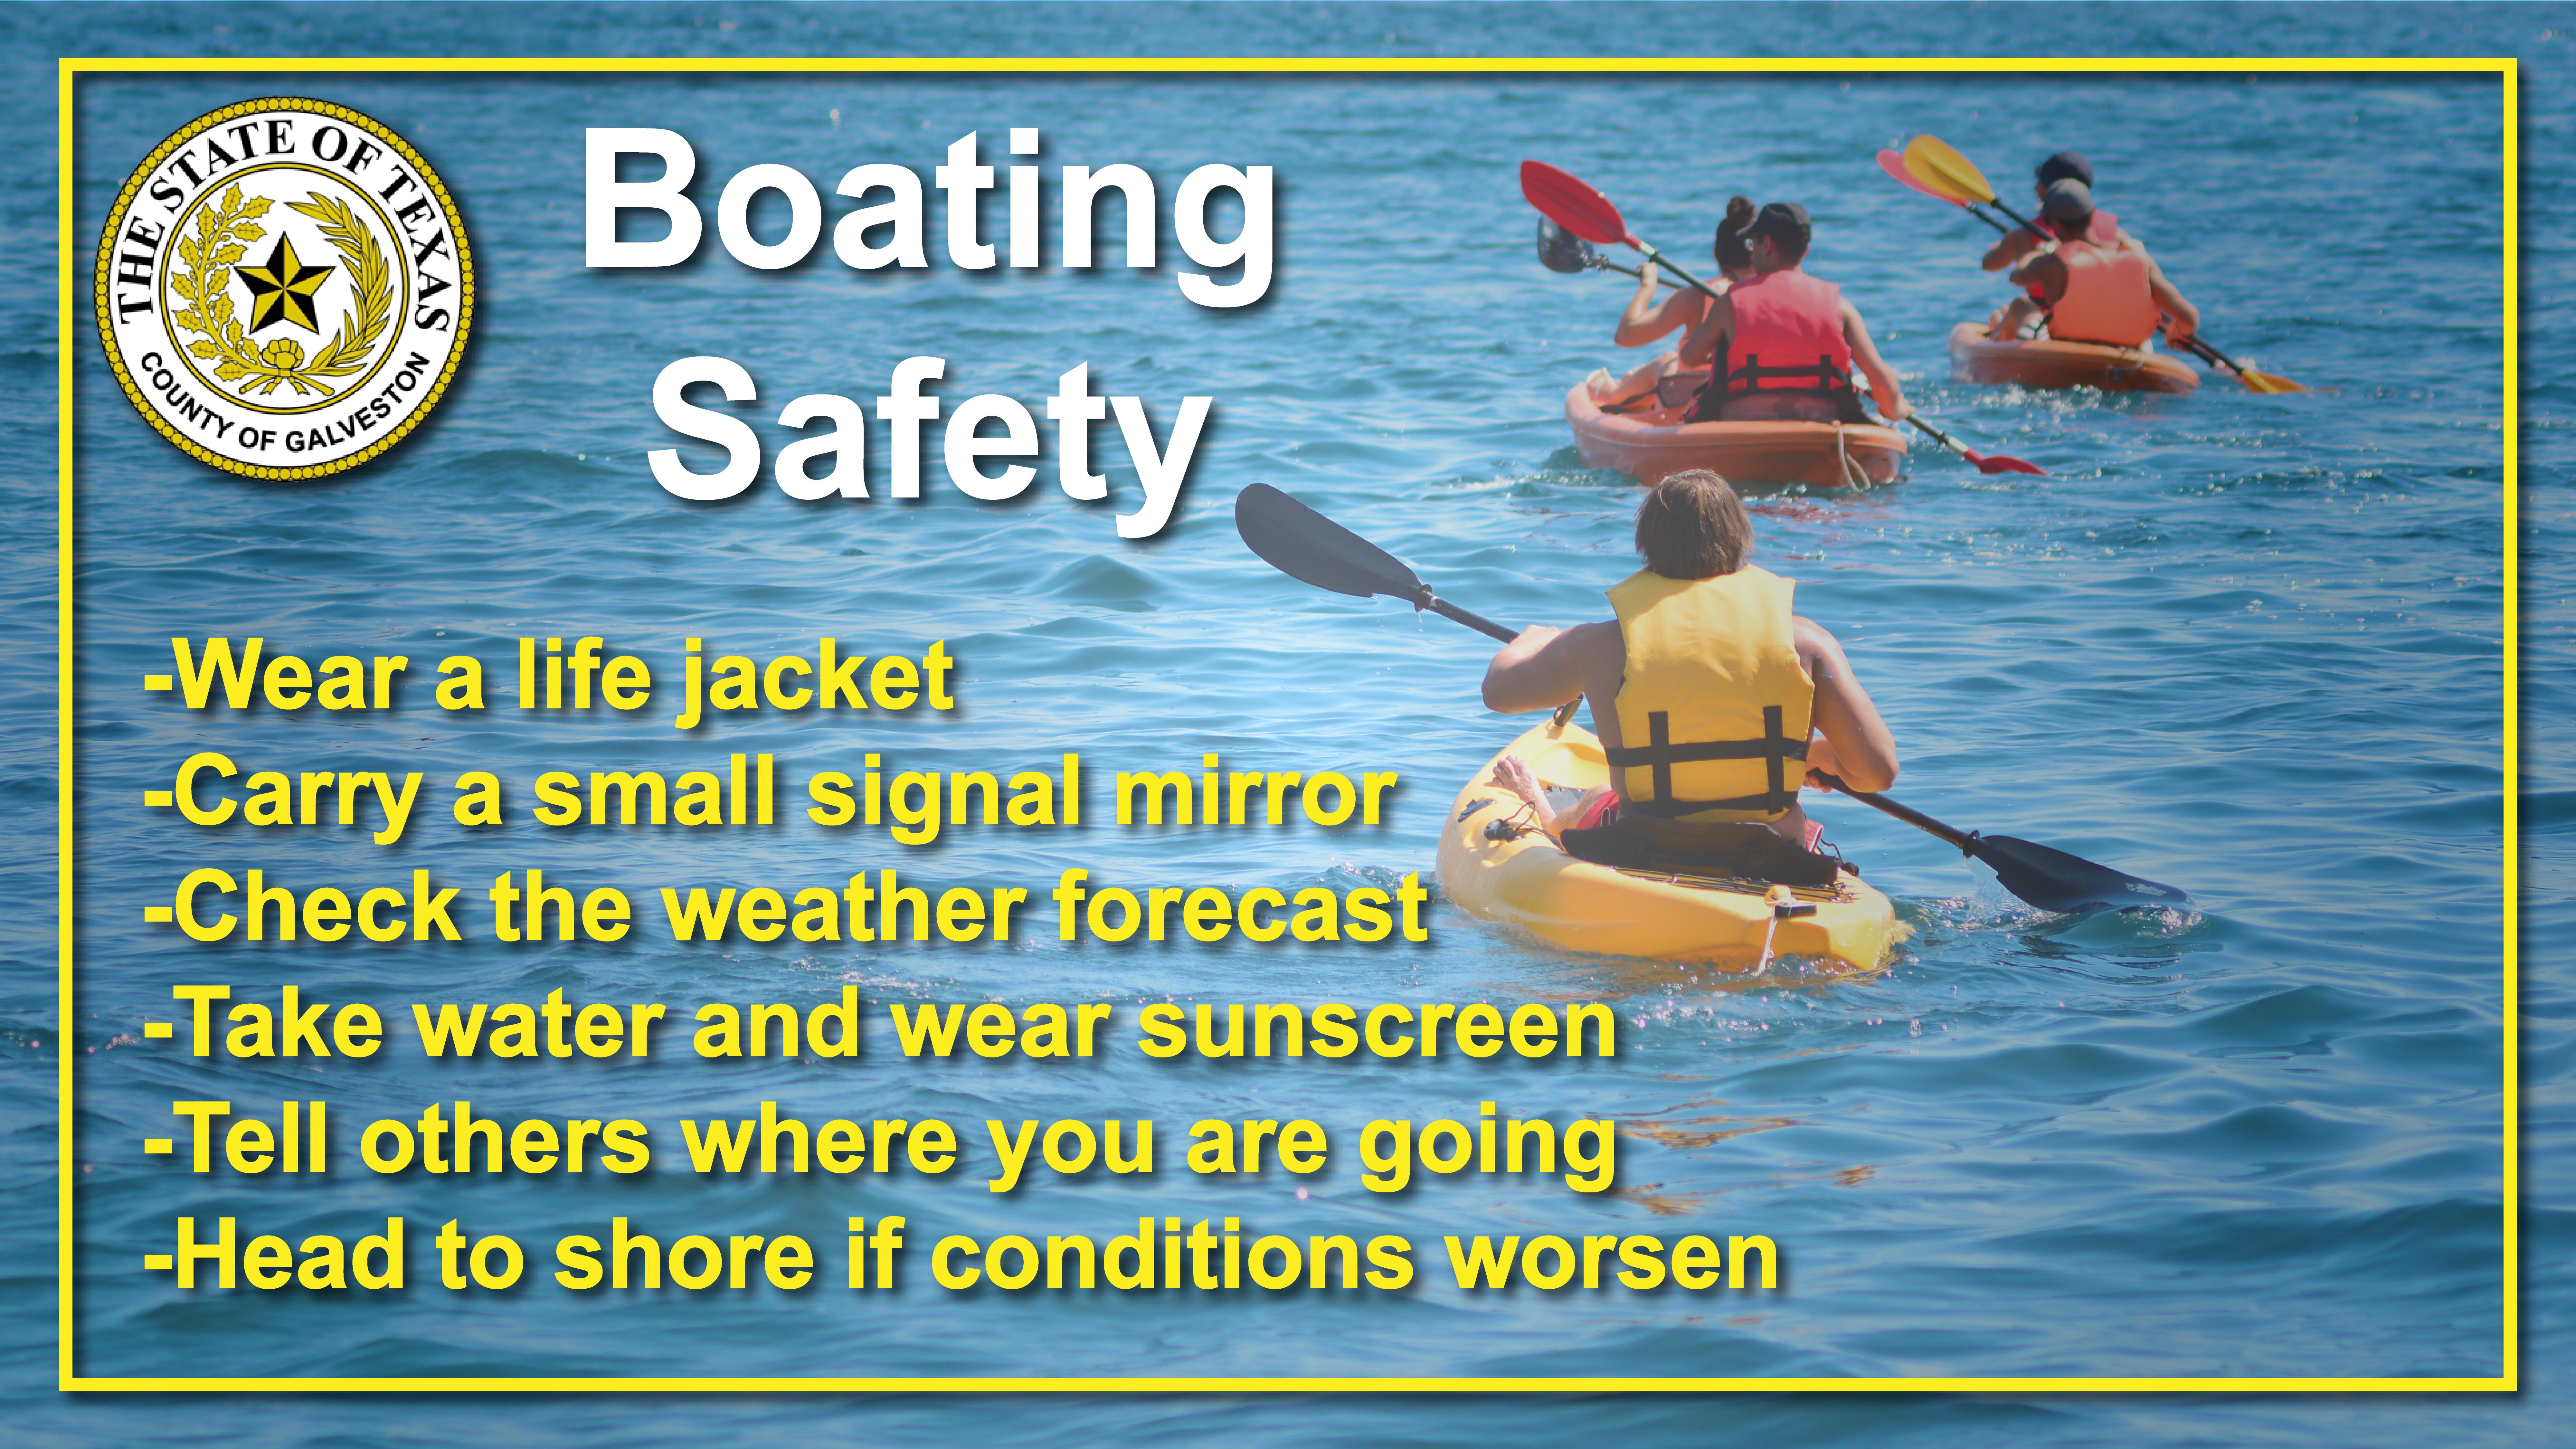 20210427 Boating Safety